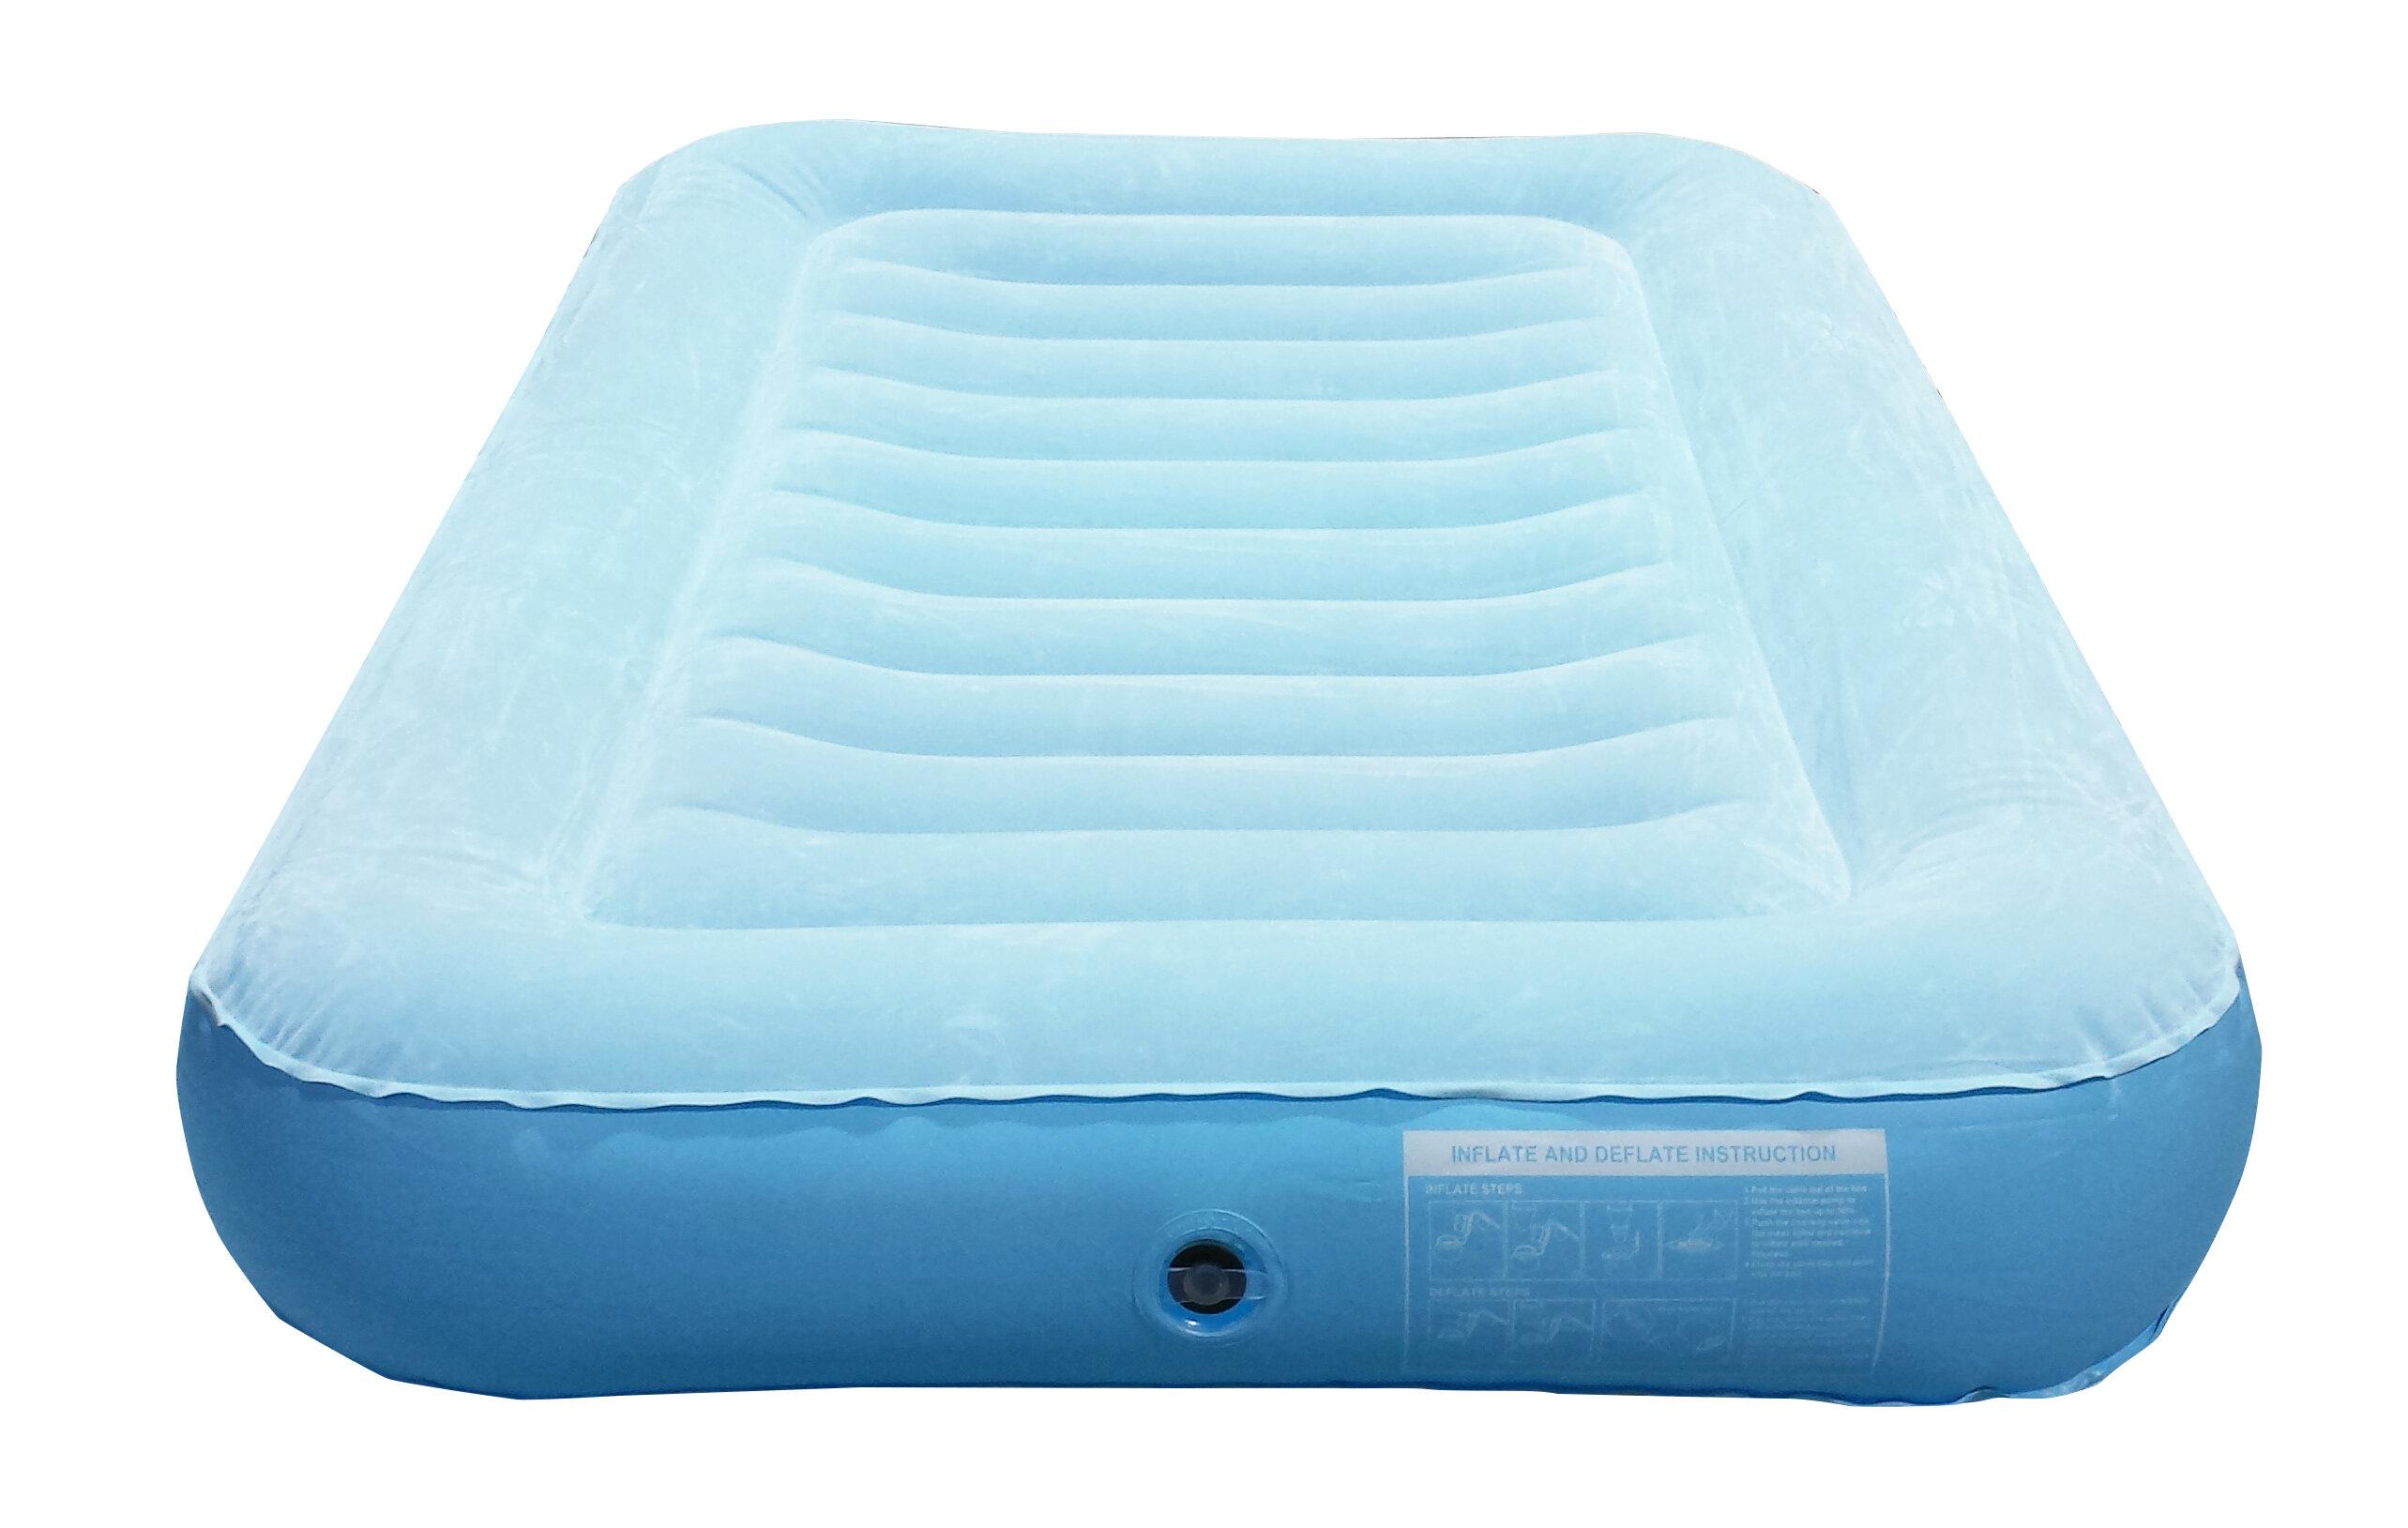 inflatable pump itm rest pillow intex w durabeam deluxe air resource mattress bed full